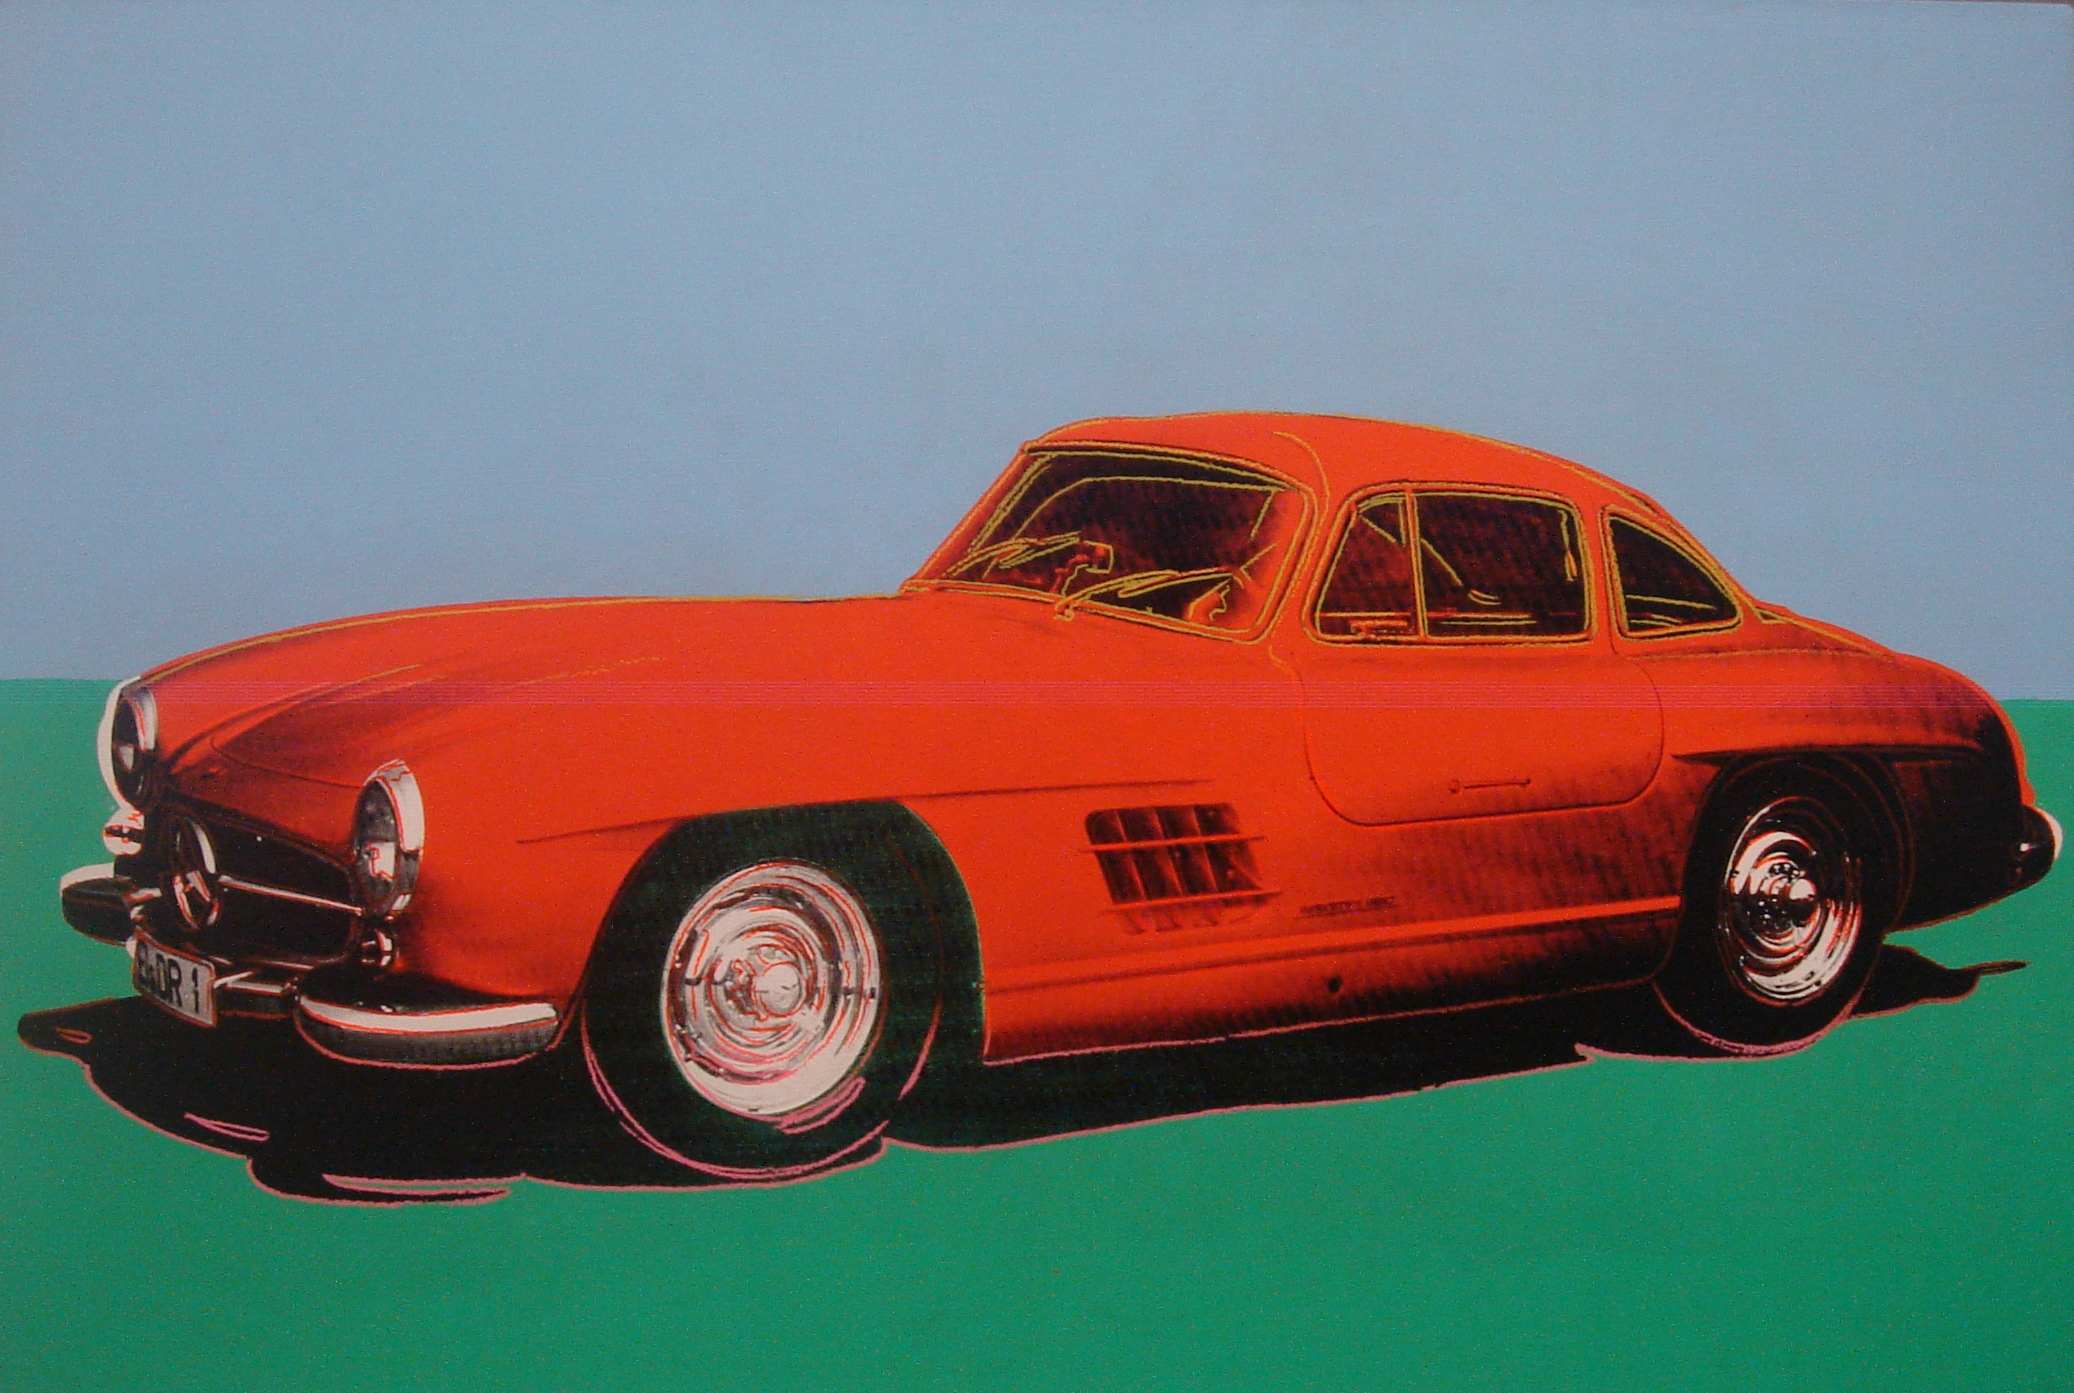 (c) Andy Warhol - Mercedes 300 SL Gullwing / Flügeltürer